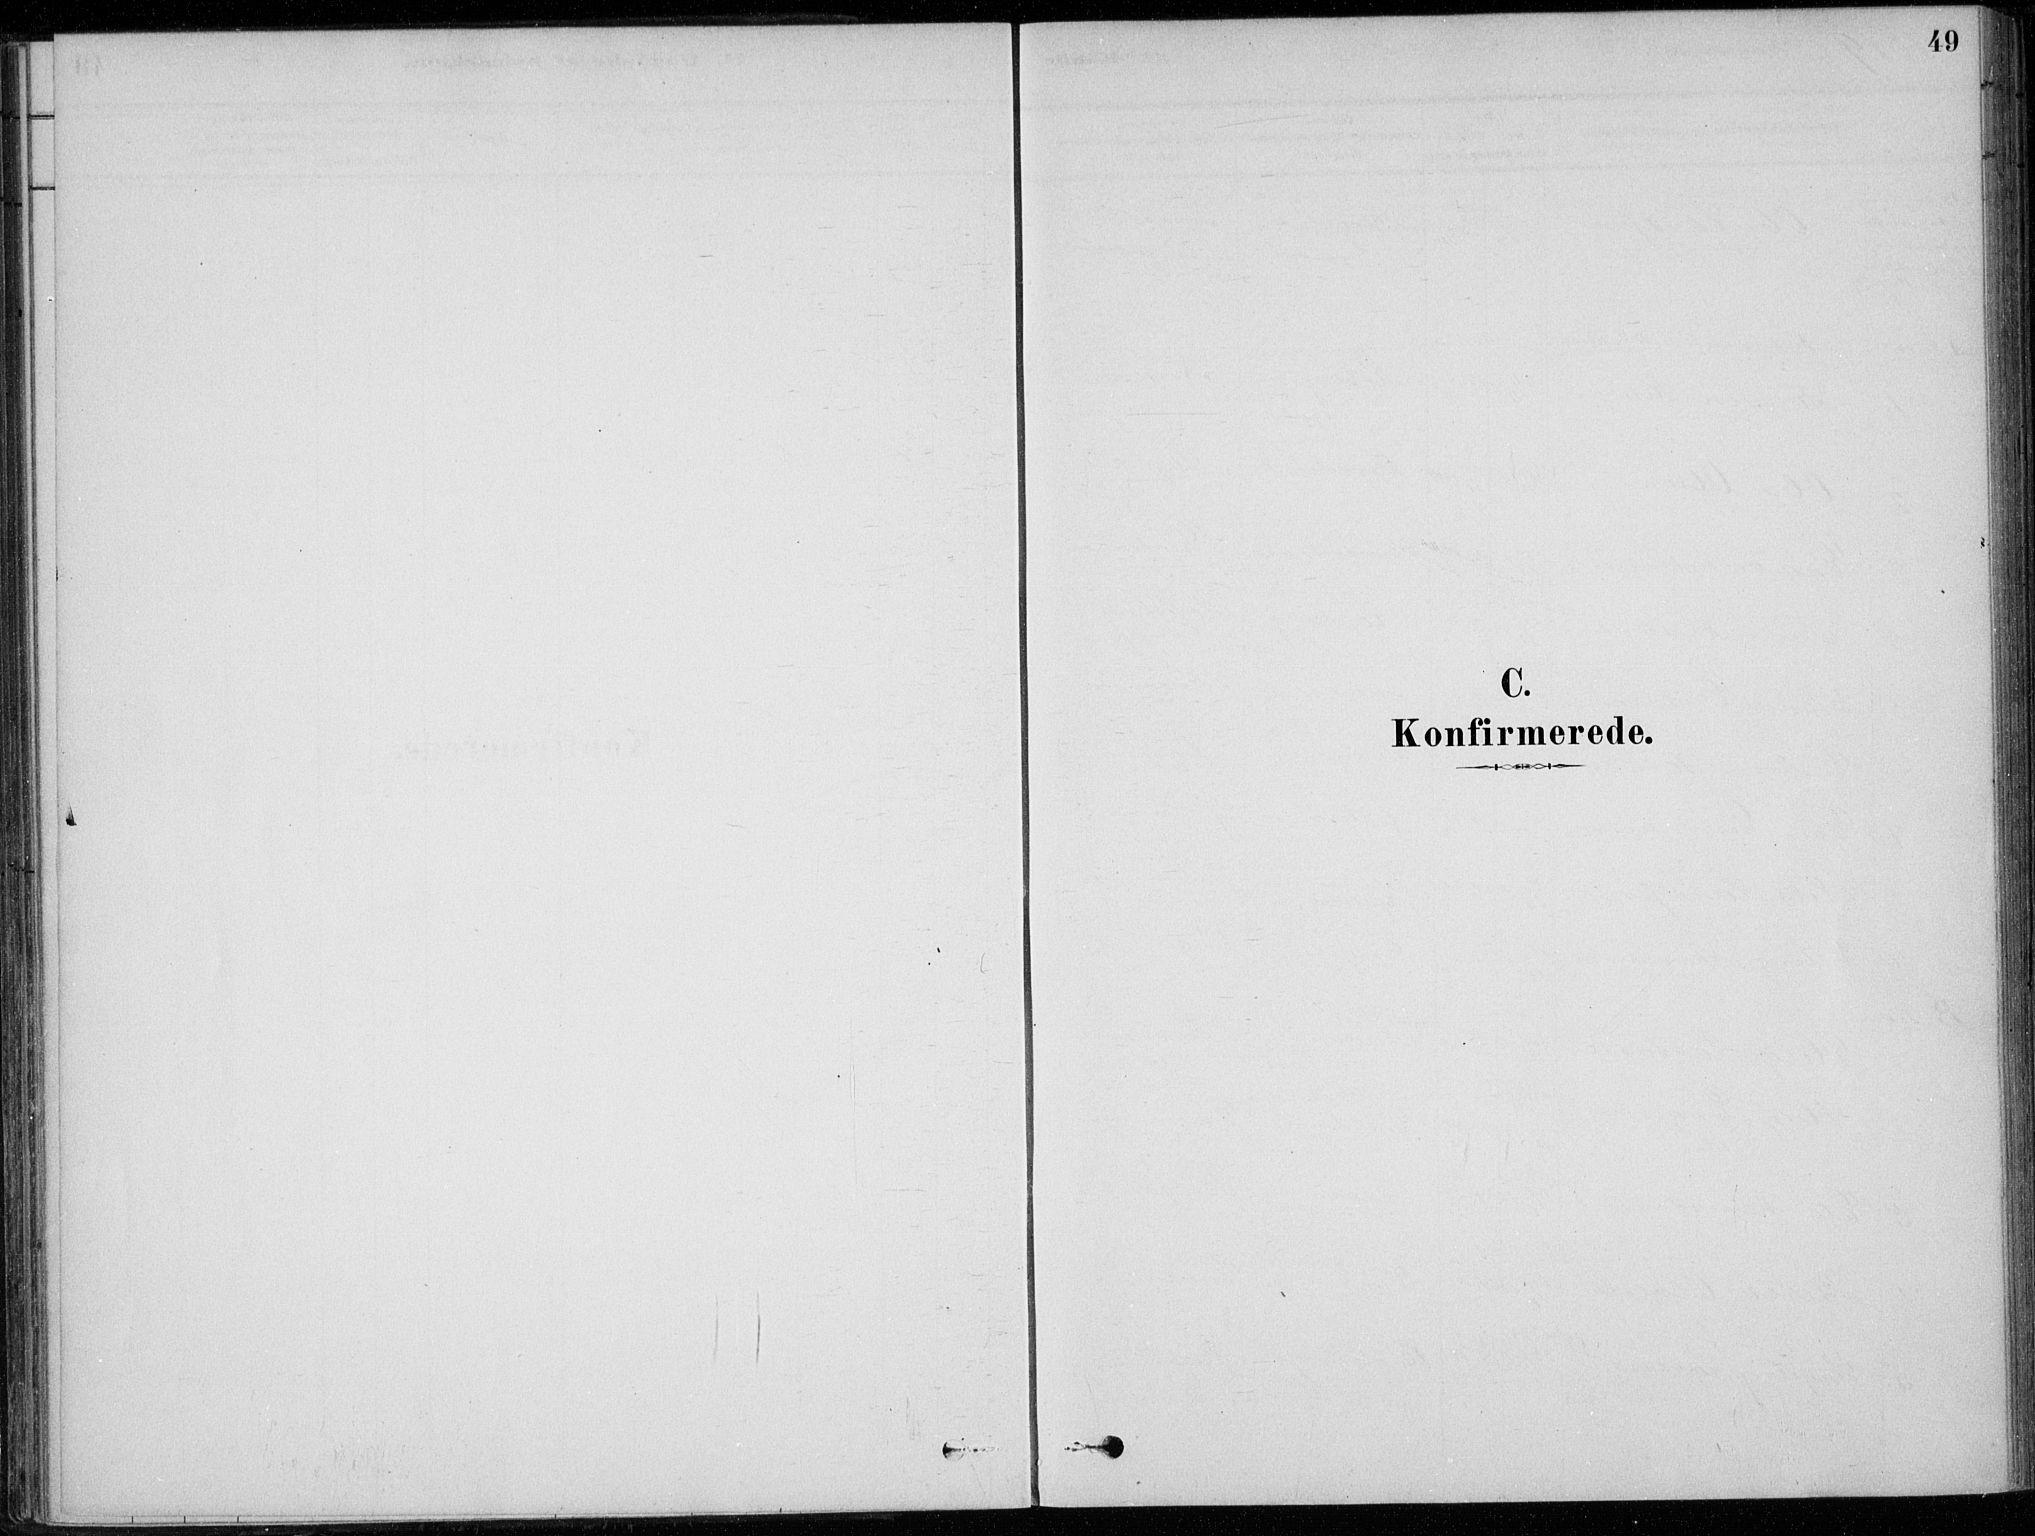 SAKO, Sigdal kirkebøker, F/Fc/L0001: Ministerialbok nr. III 1, 1879-1893, s. 49